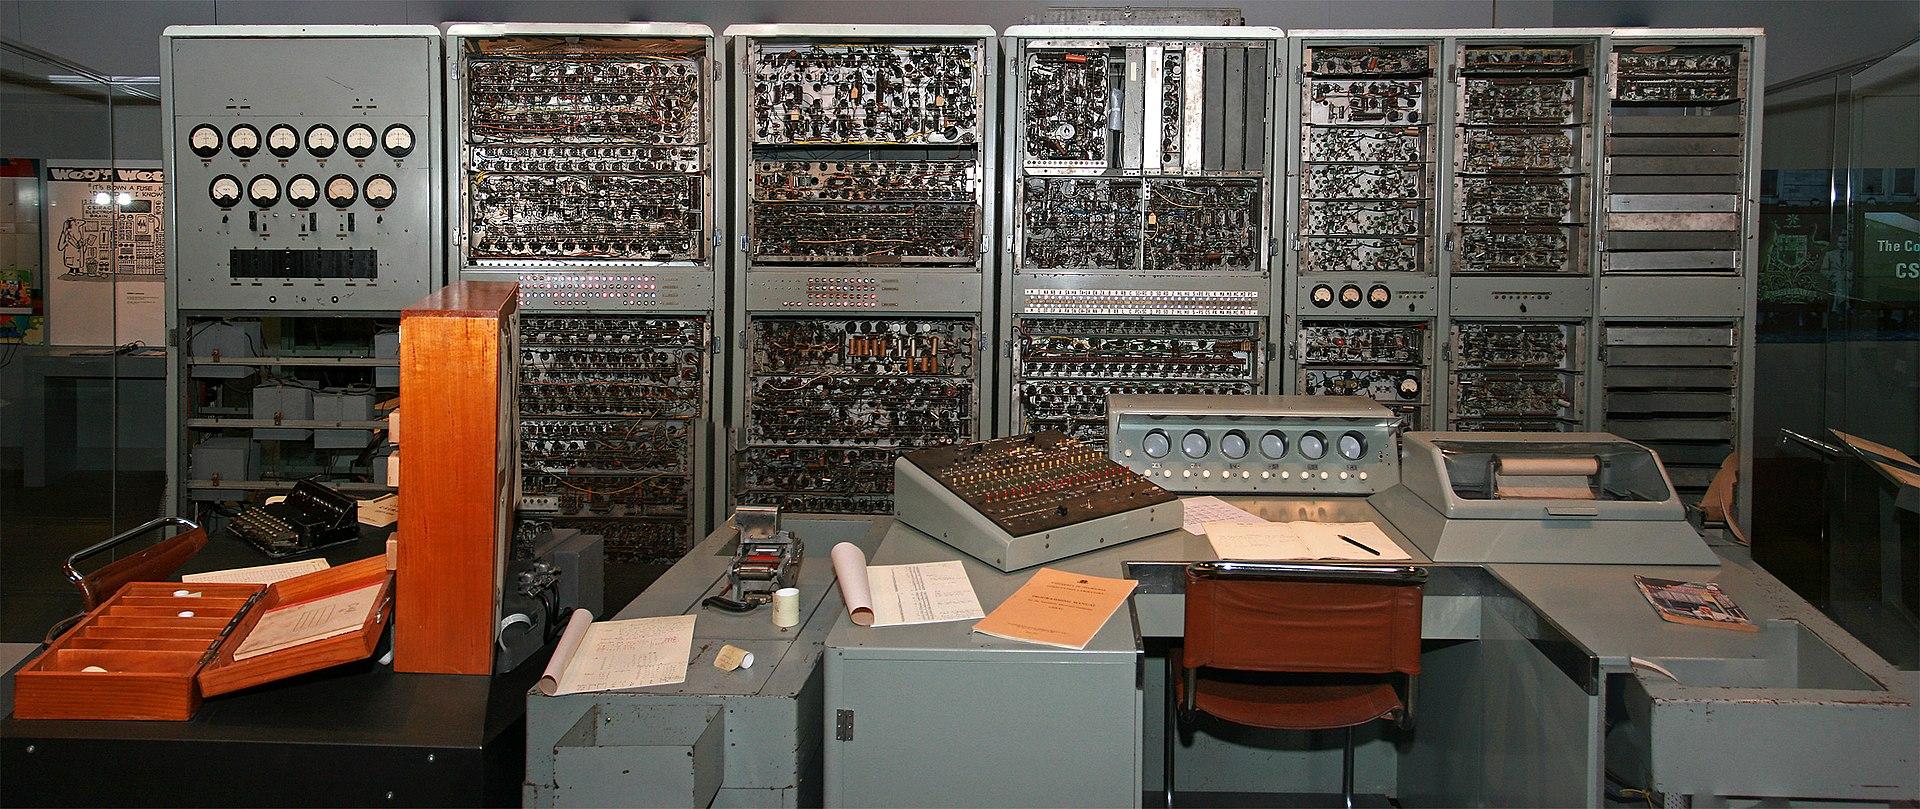 CSIRAC-Pano,-Melb.-Museum,-12.8.2008.jpg